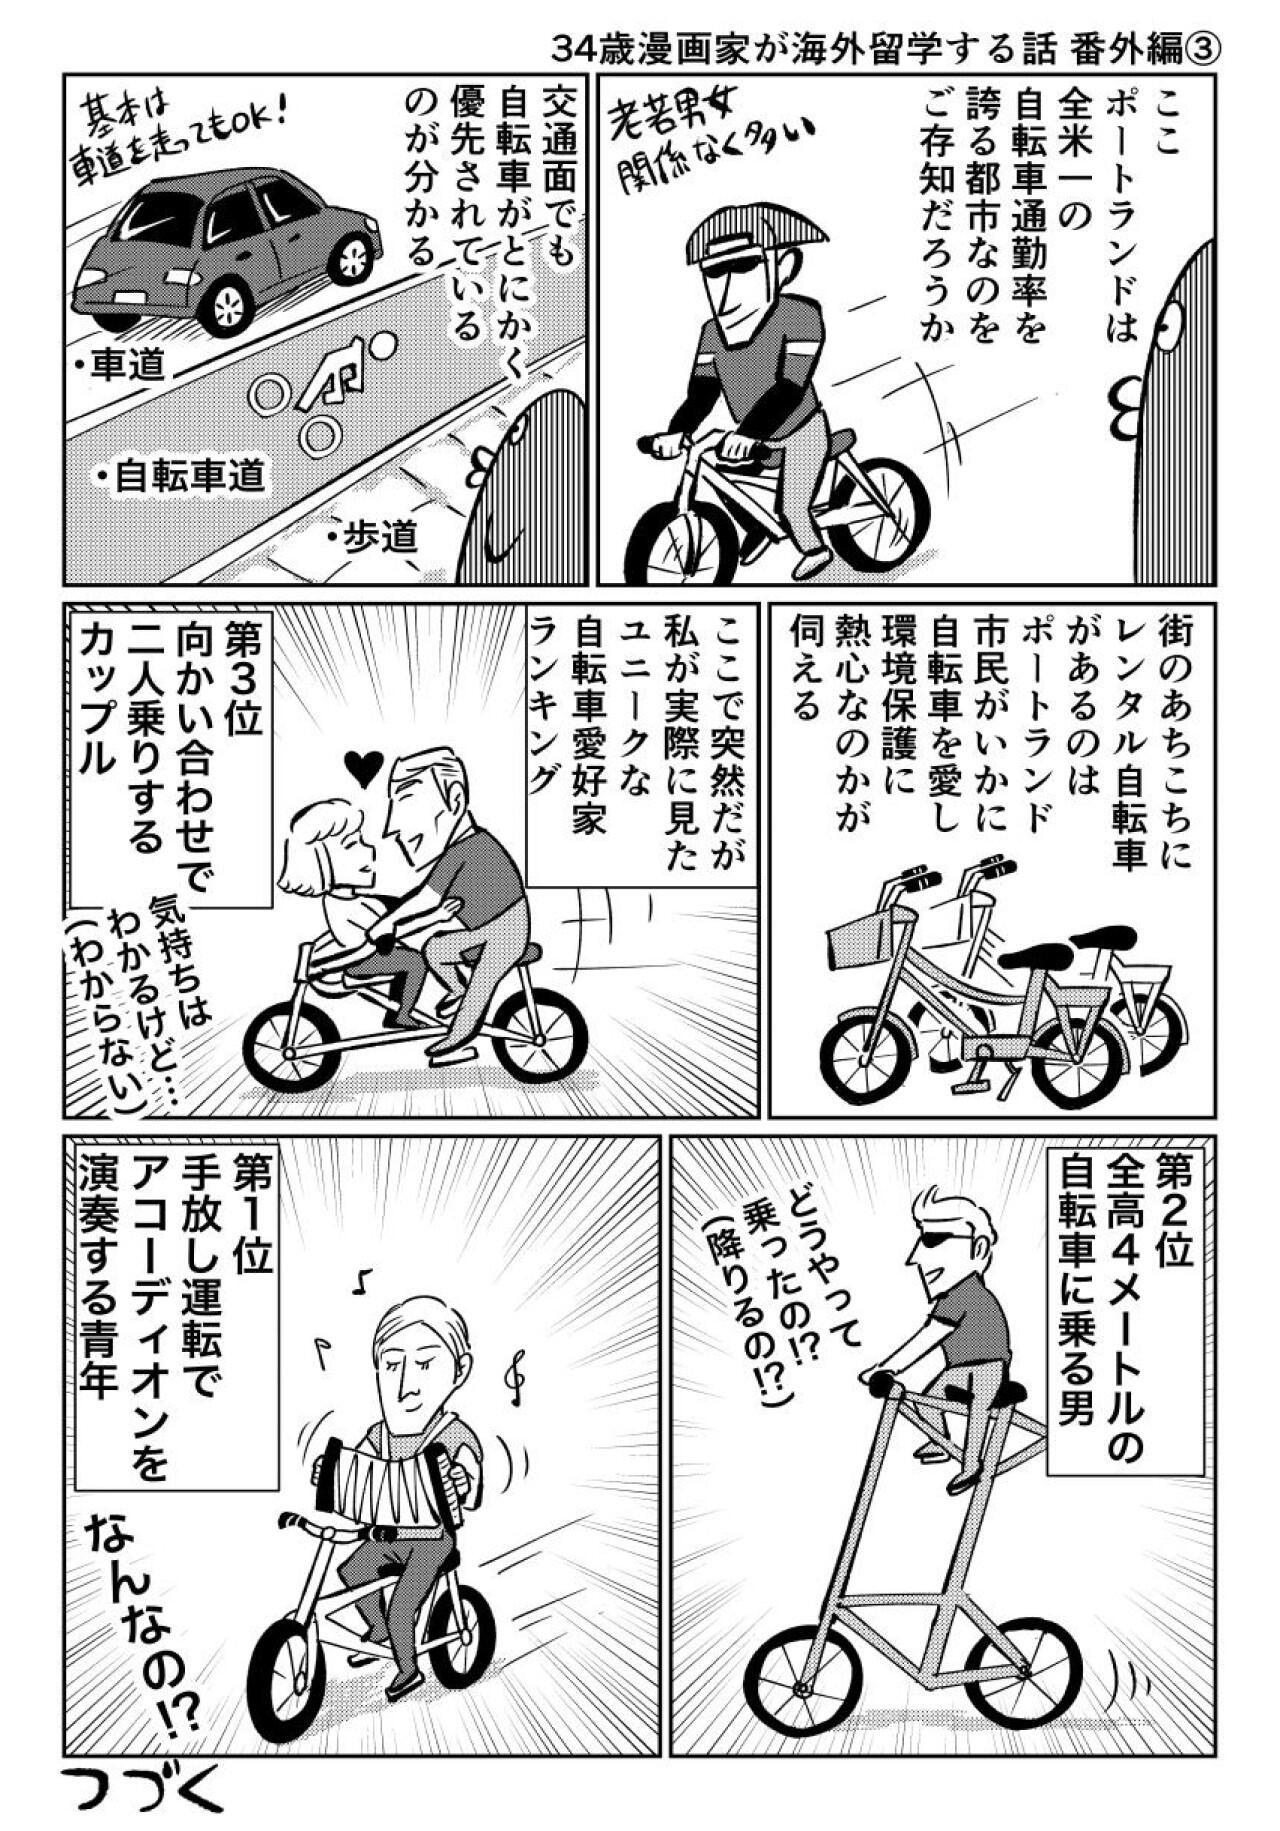 https://www.ryugaku.co.jp/column/images/34sai_ex3_1280.jpg